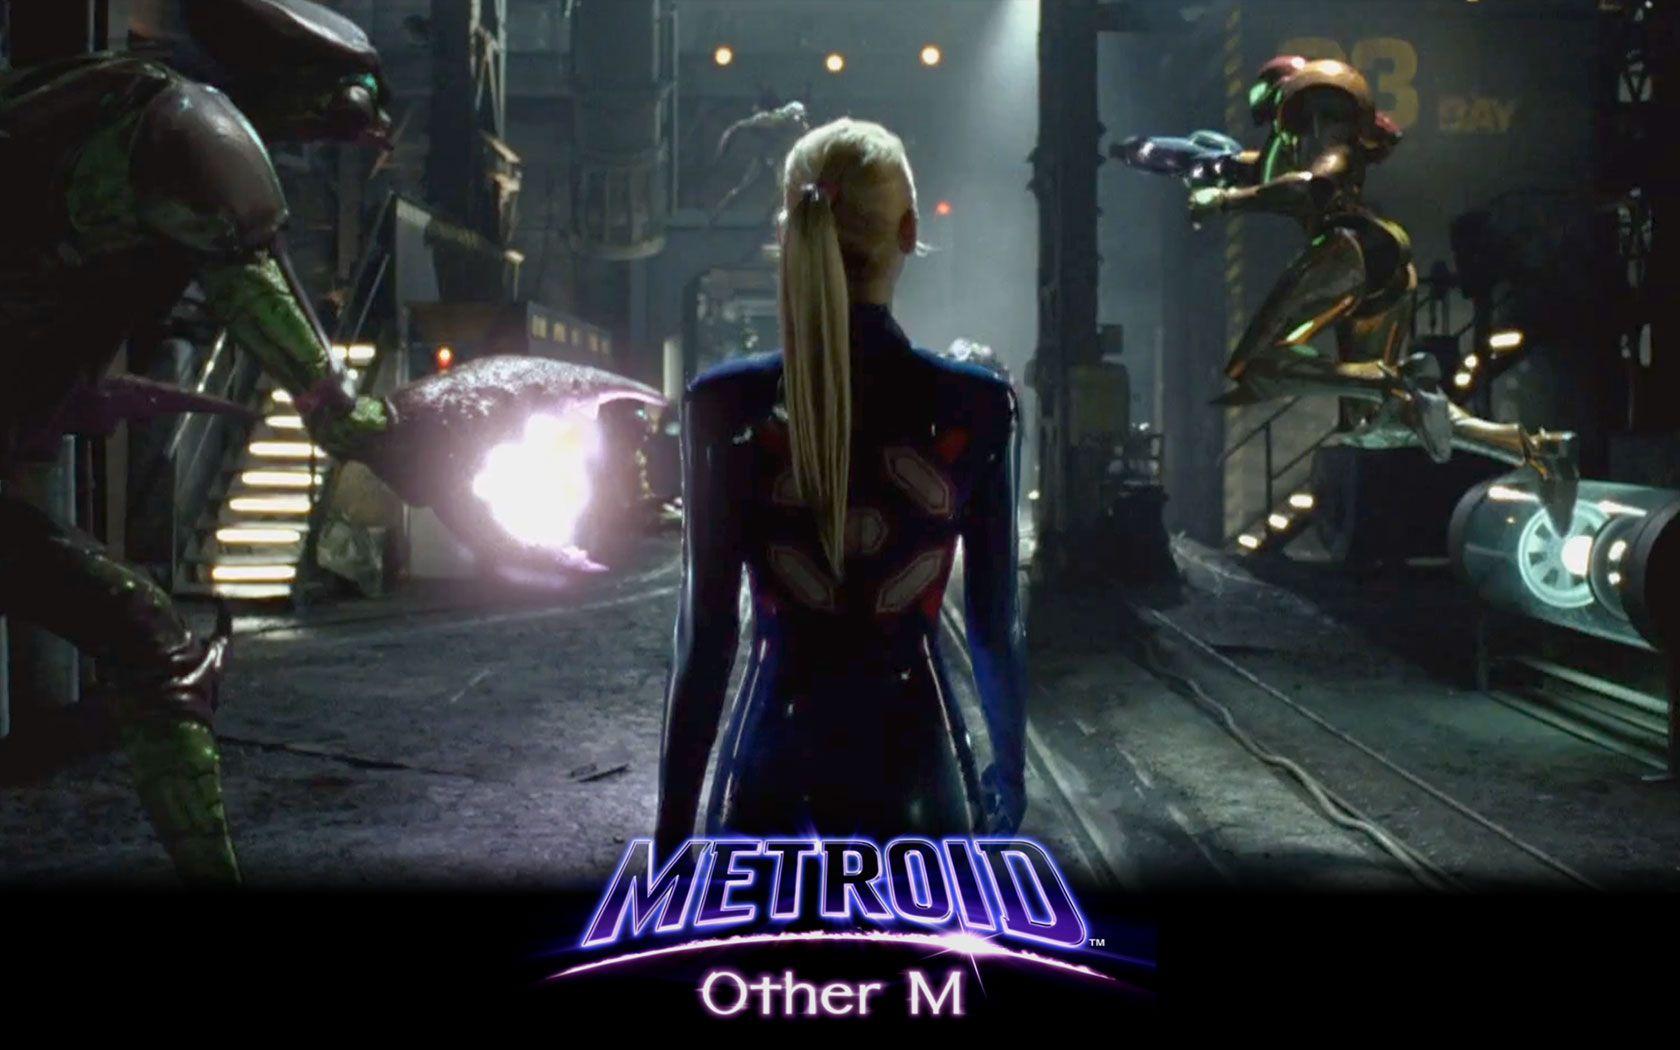 Metroid Other M Trailer Screenshot Metroid Metroid Other